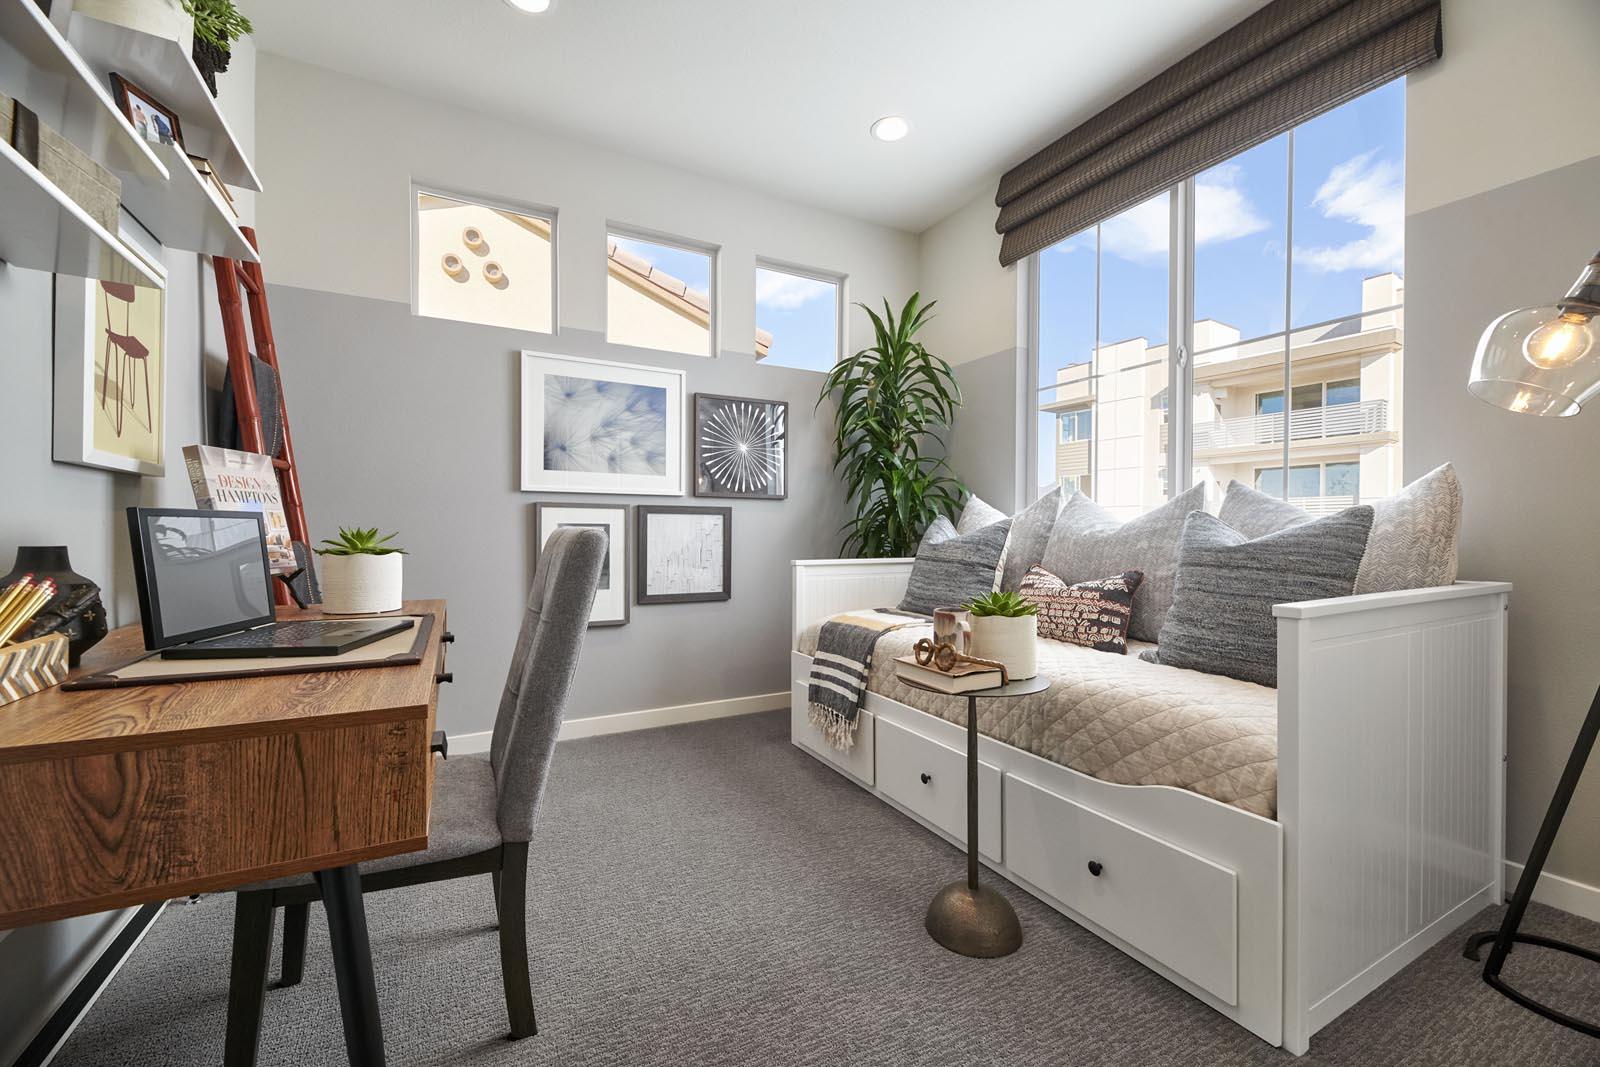 Office | Residence 1 | Lumin | New Homes in Rancho Cucamonga, CA | Van Daele Homes